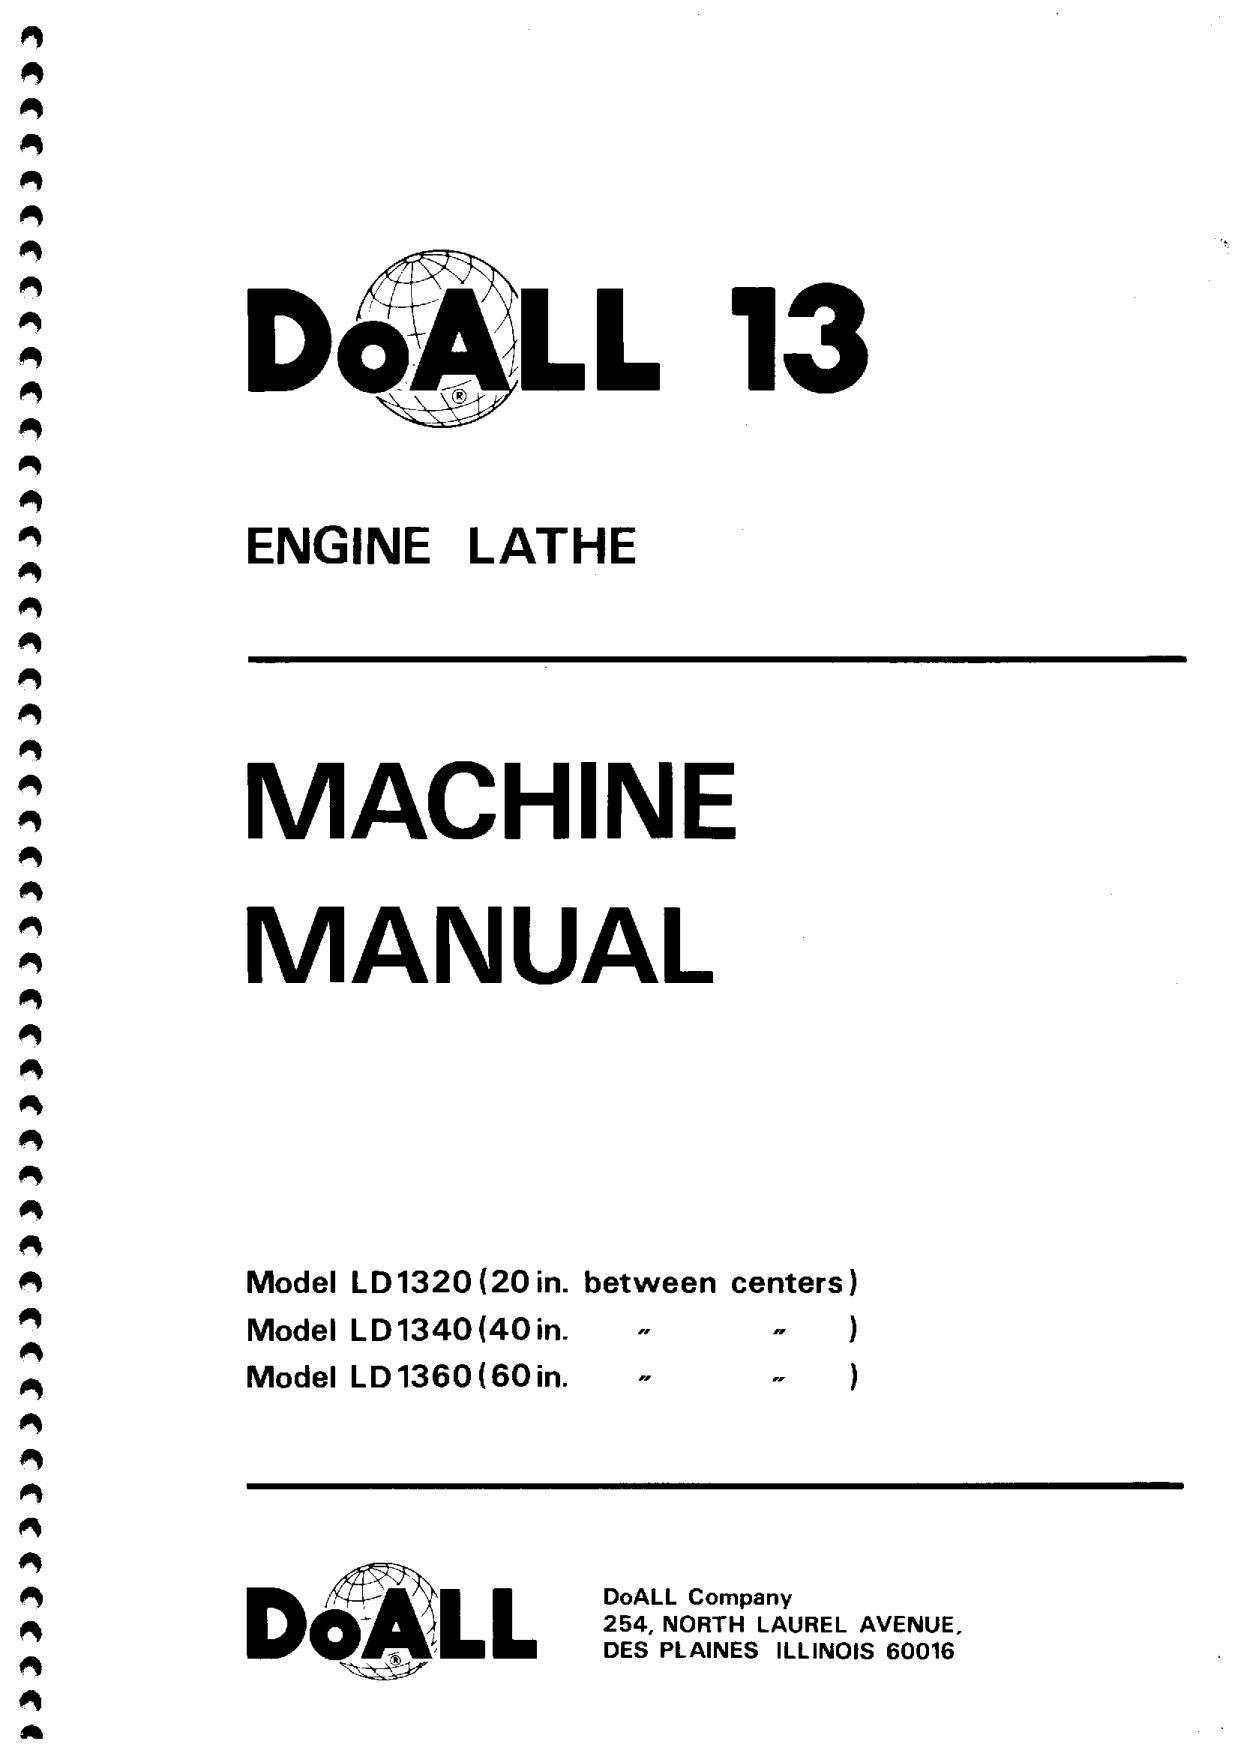 doall 13 engine lathe machine manual 20140205 Doall 13 Lathe Parts List